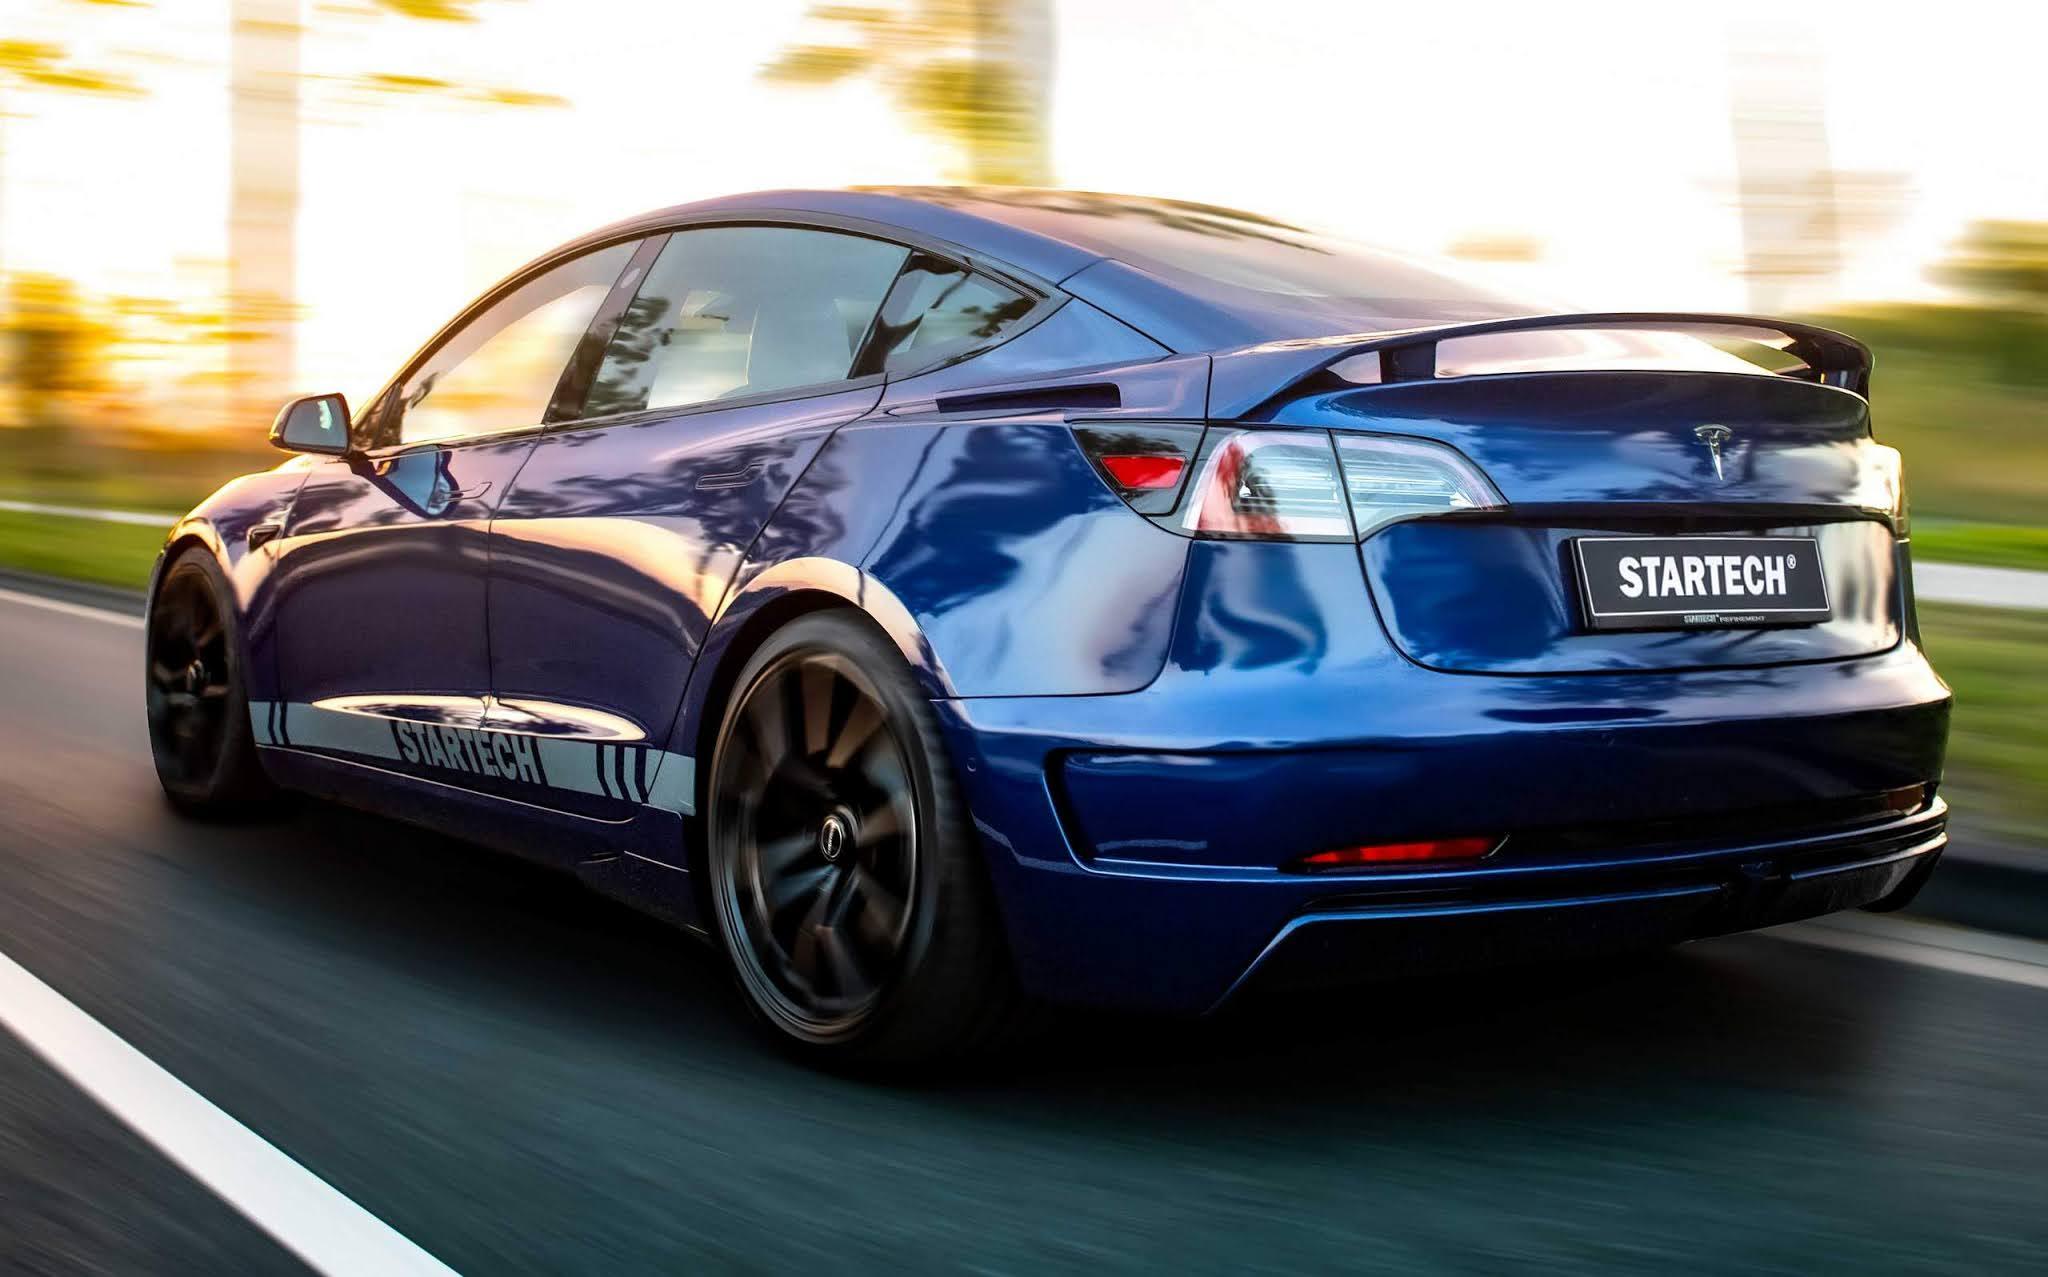 Tesla Model 3 personalizado pela Brabus americana - fotos ...